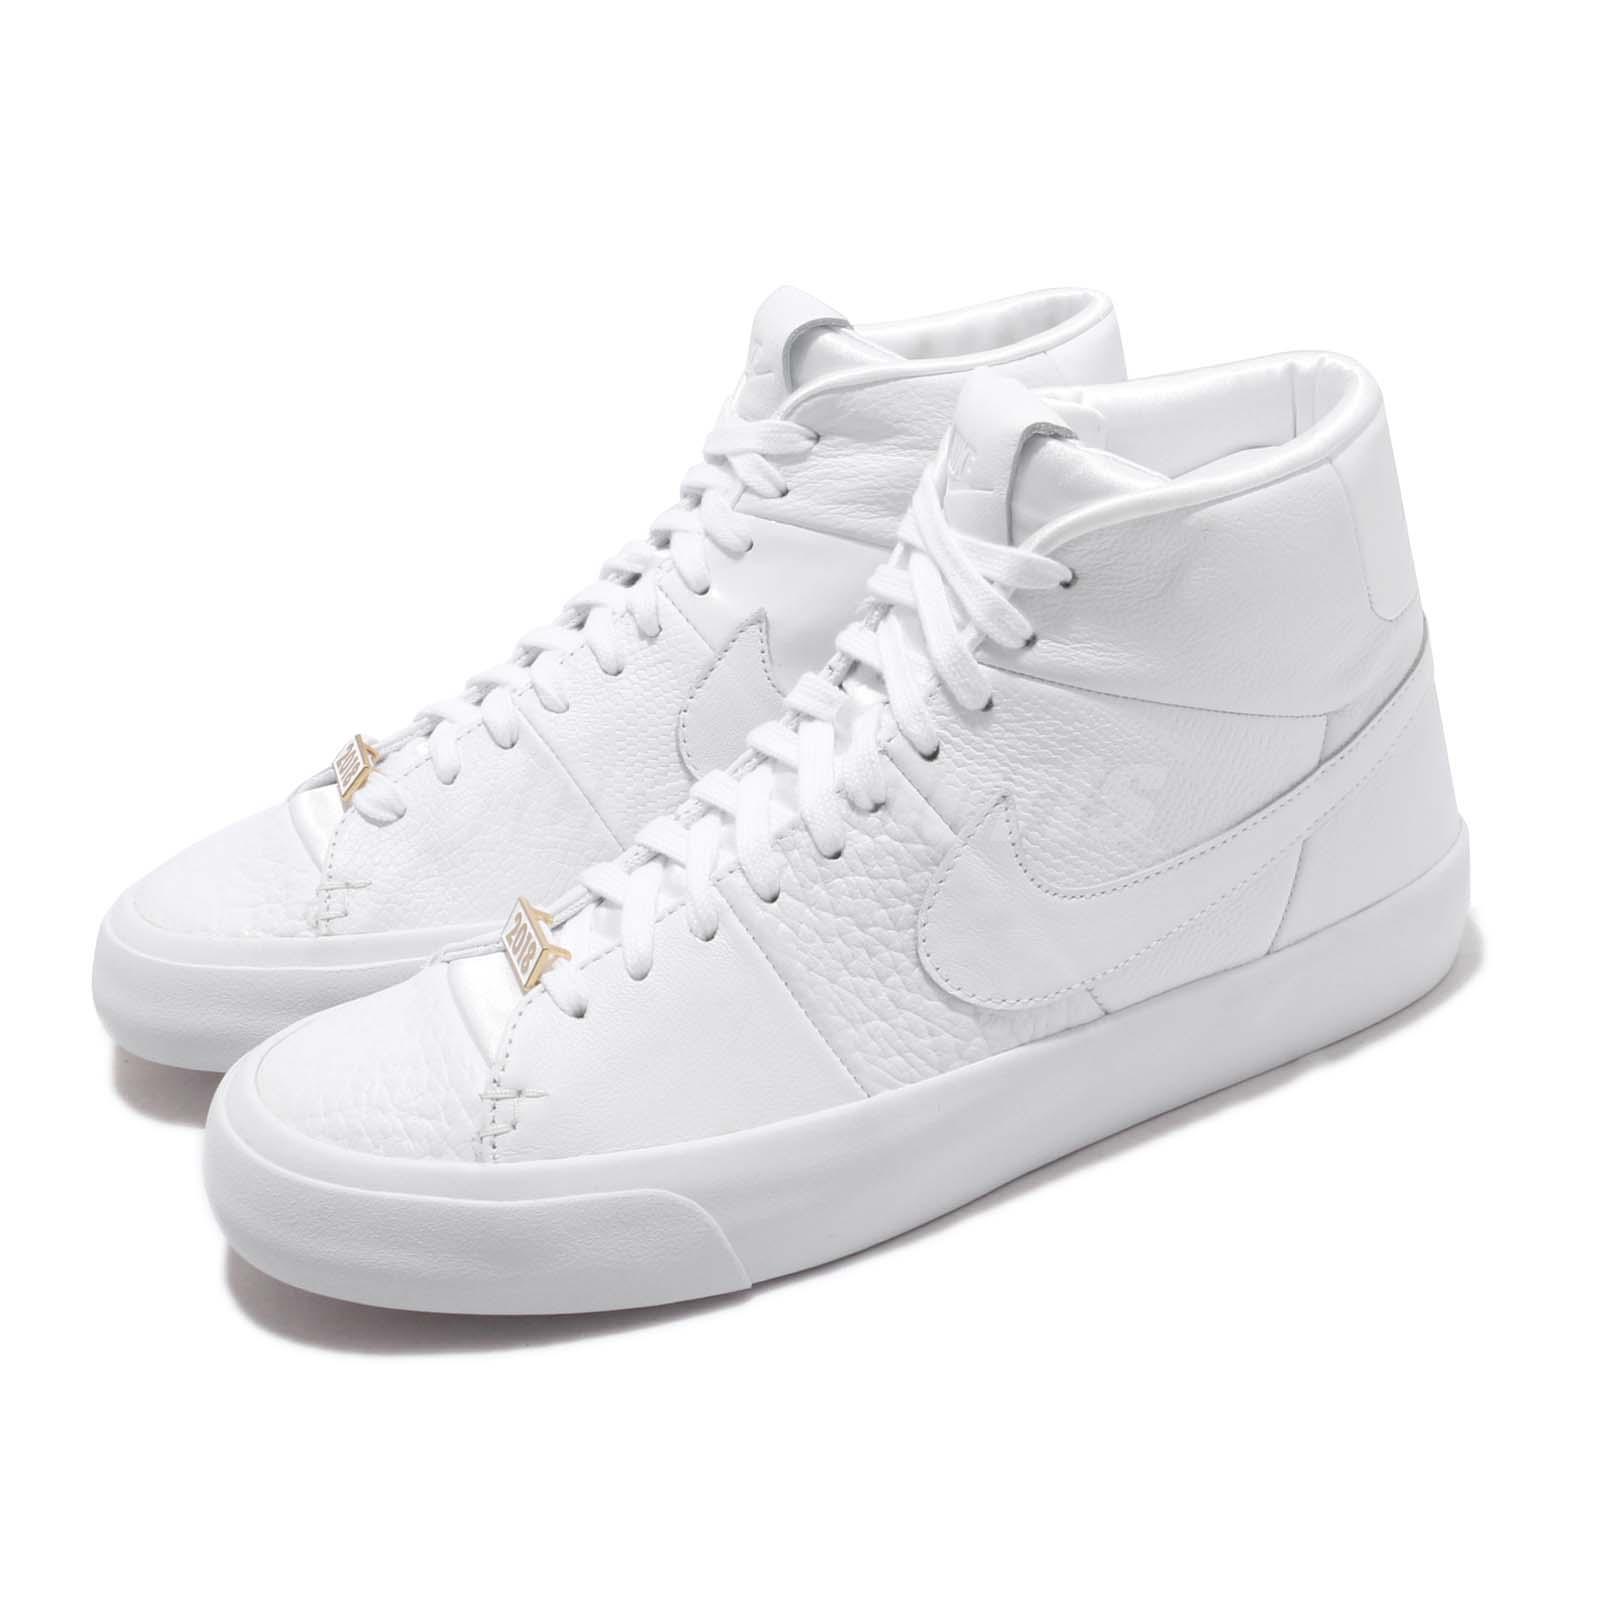 Nike Blazer Royal QS White gold Men Casual Lifestyle shoes Sneakers AR8830-100